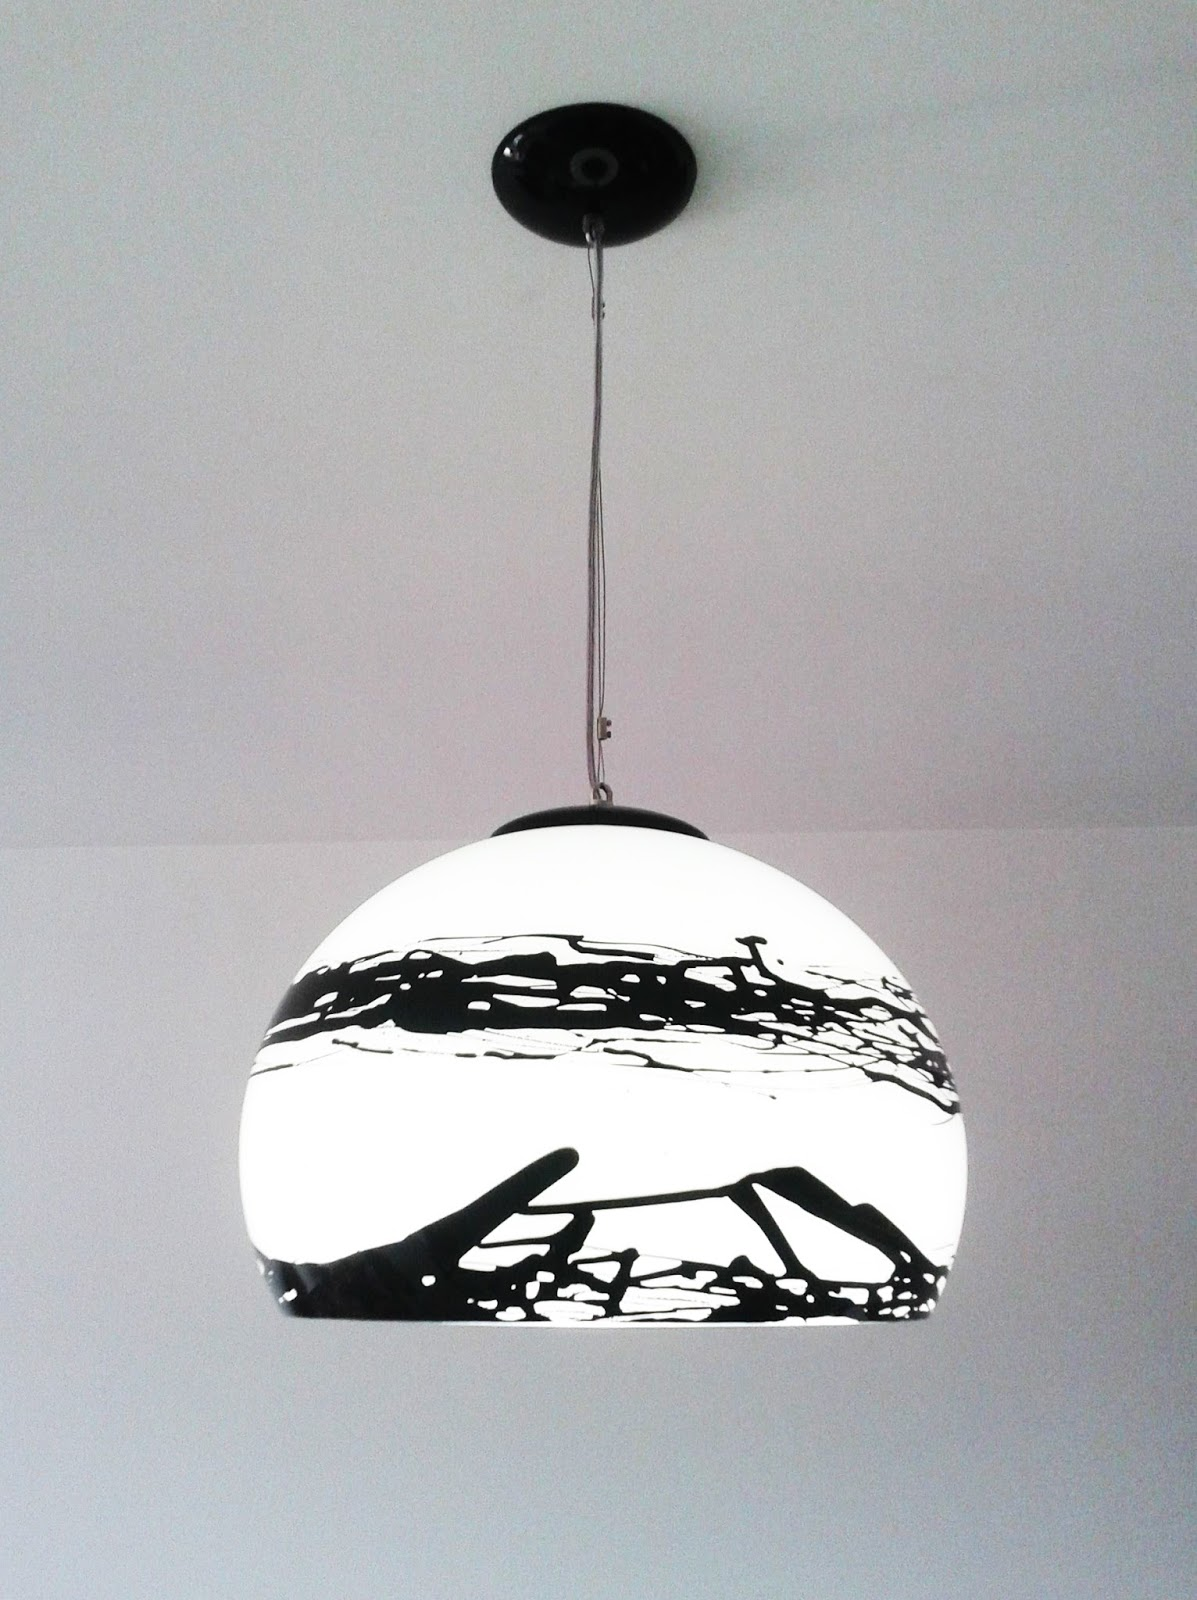 Ludica iluminacion lamparas de acrilico de techo colgantes - Iluminacion de techo ...